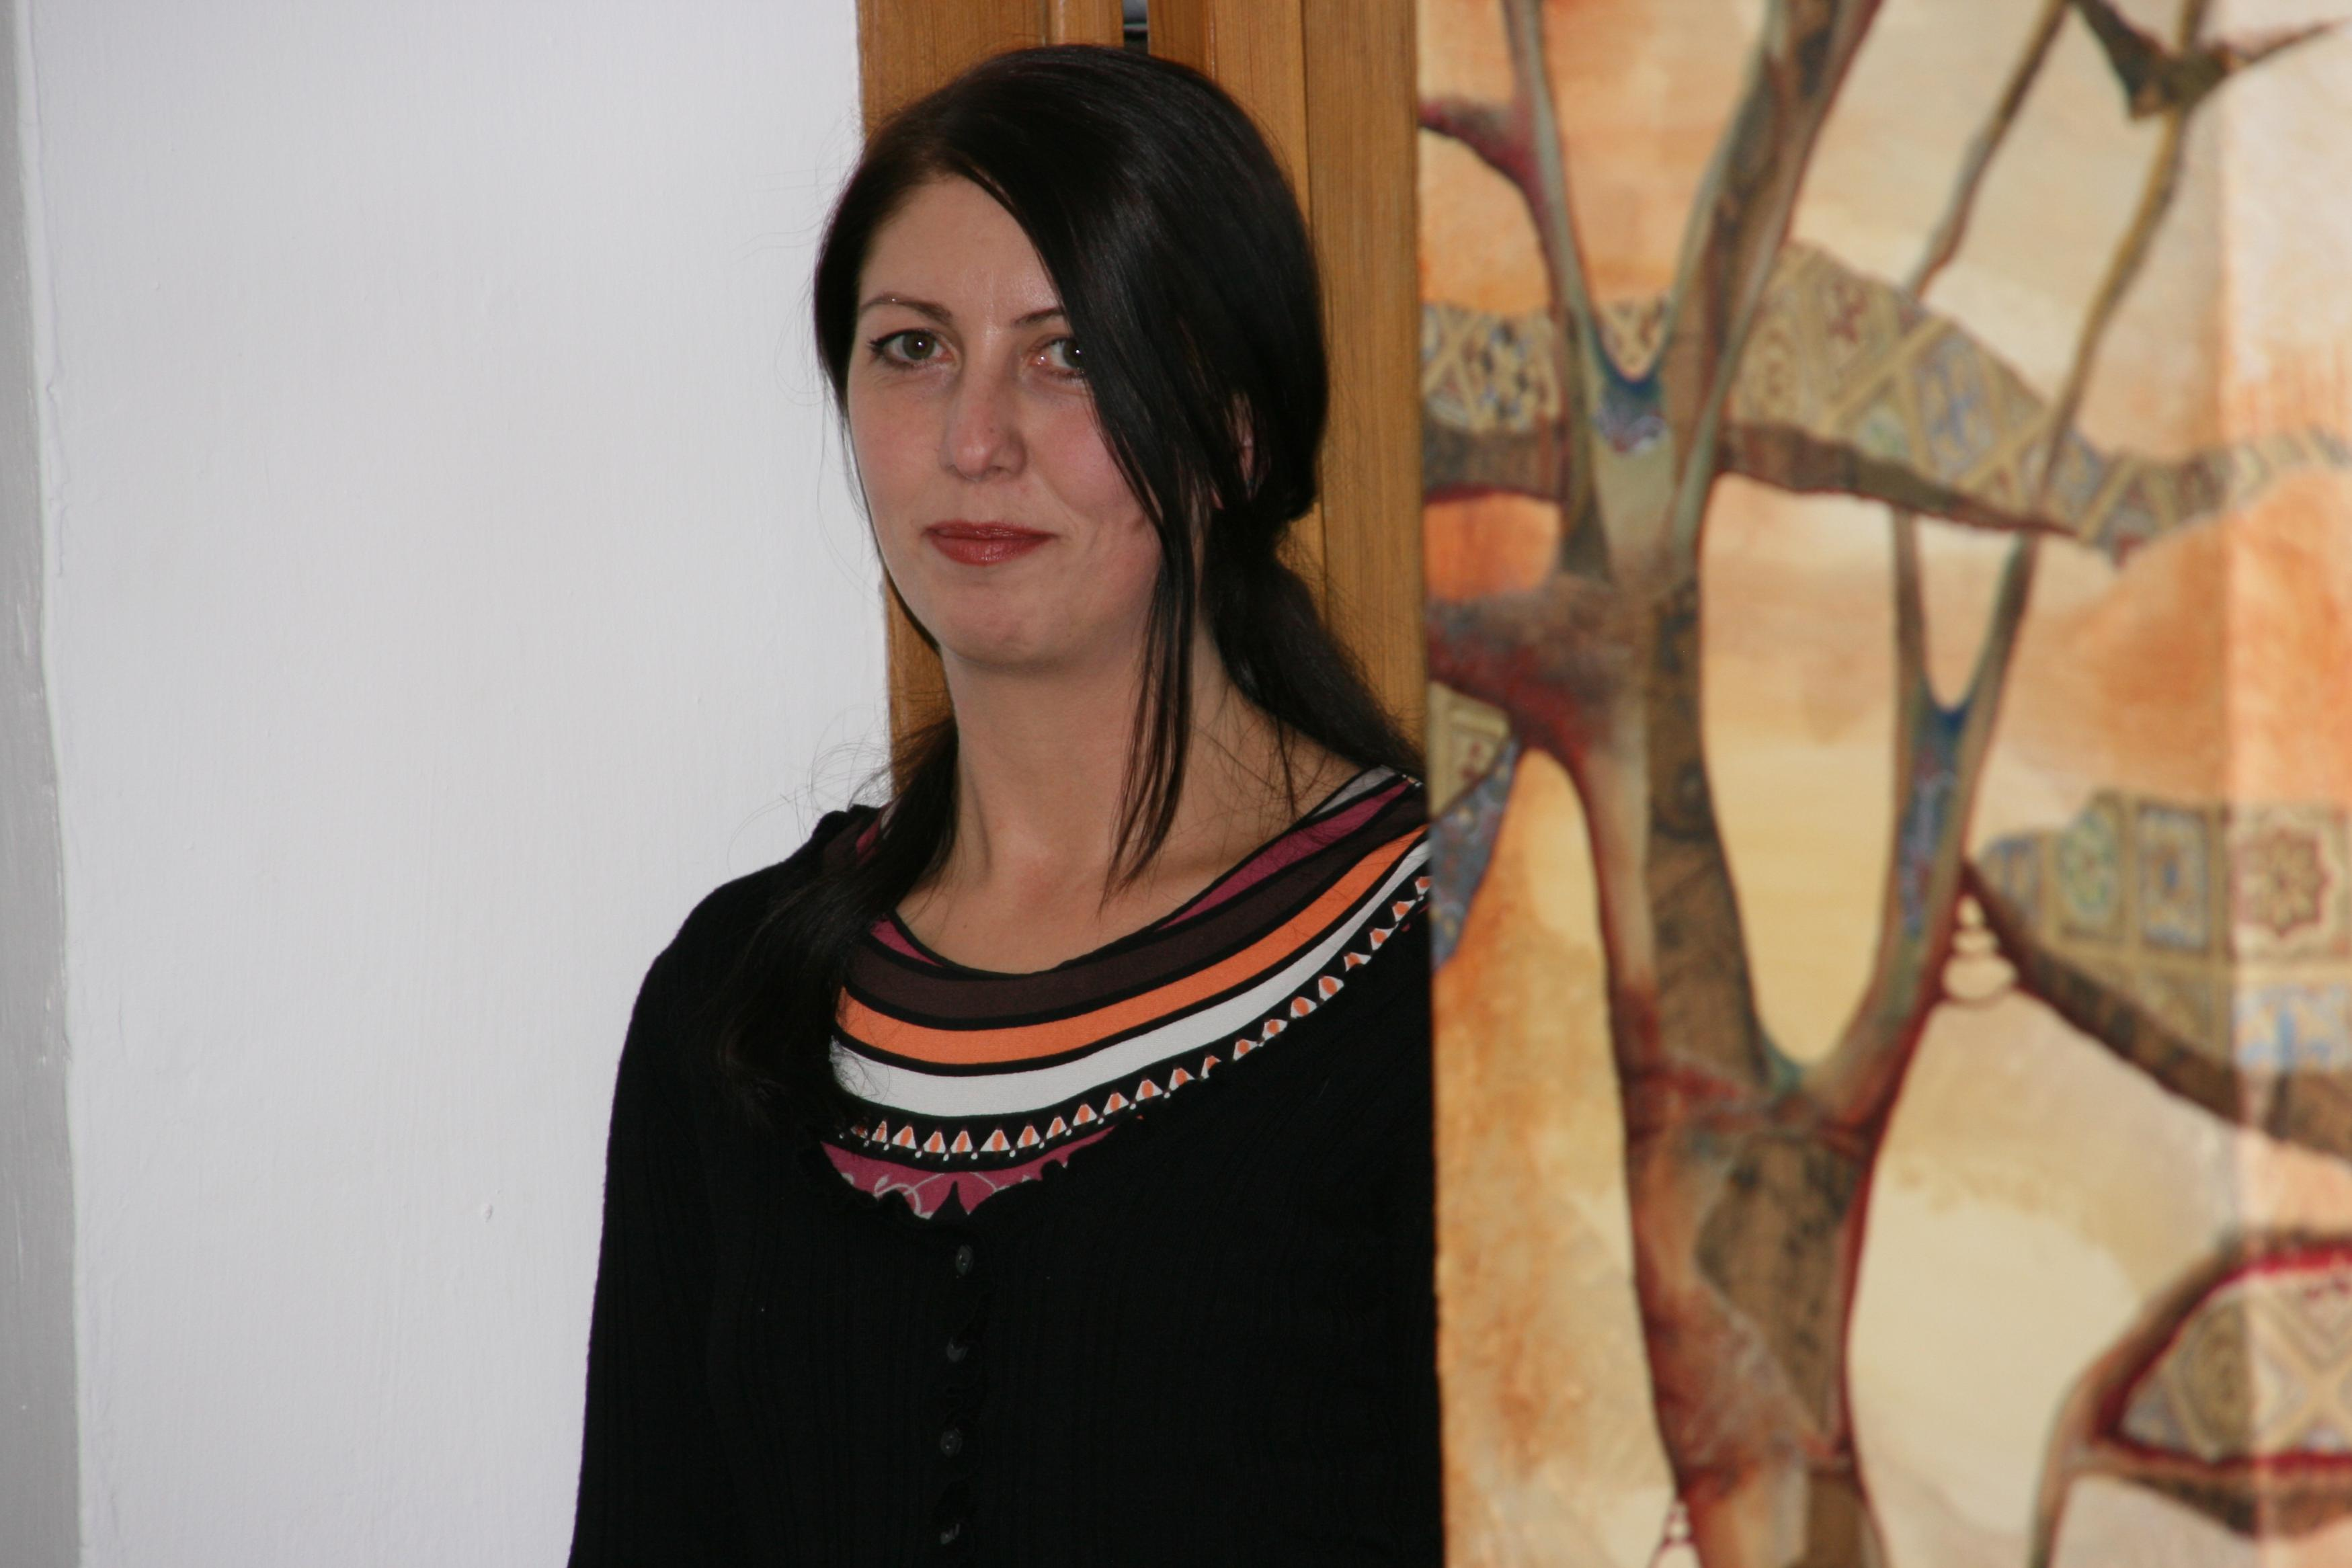 Judith Unfug-Leinhos